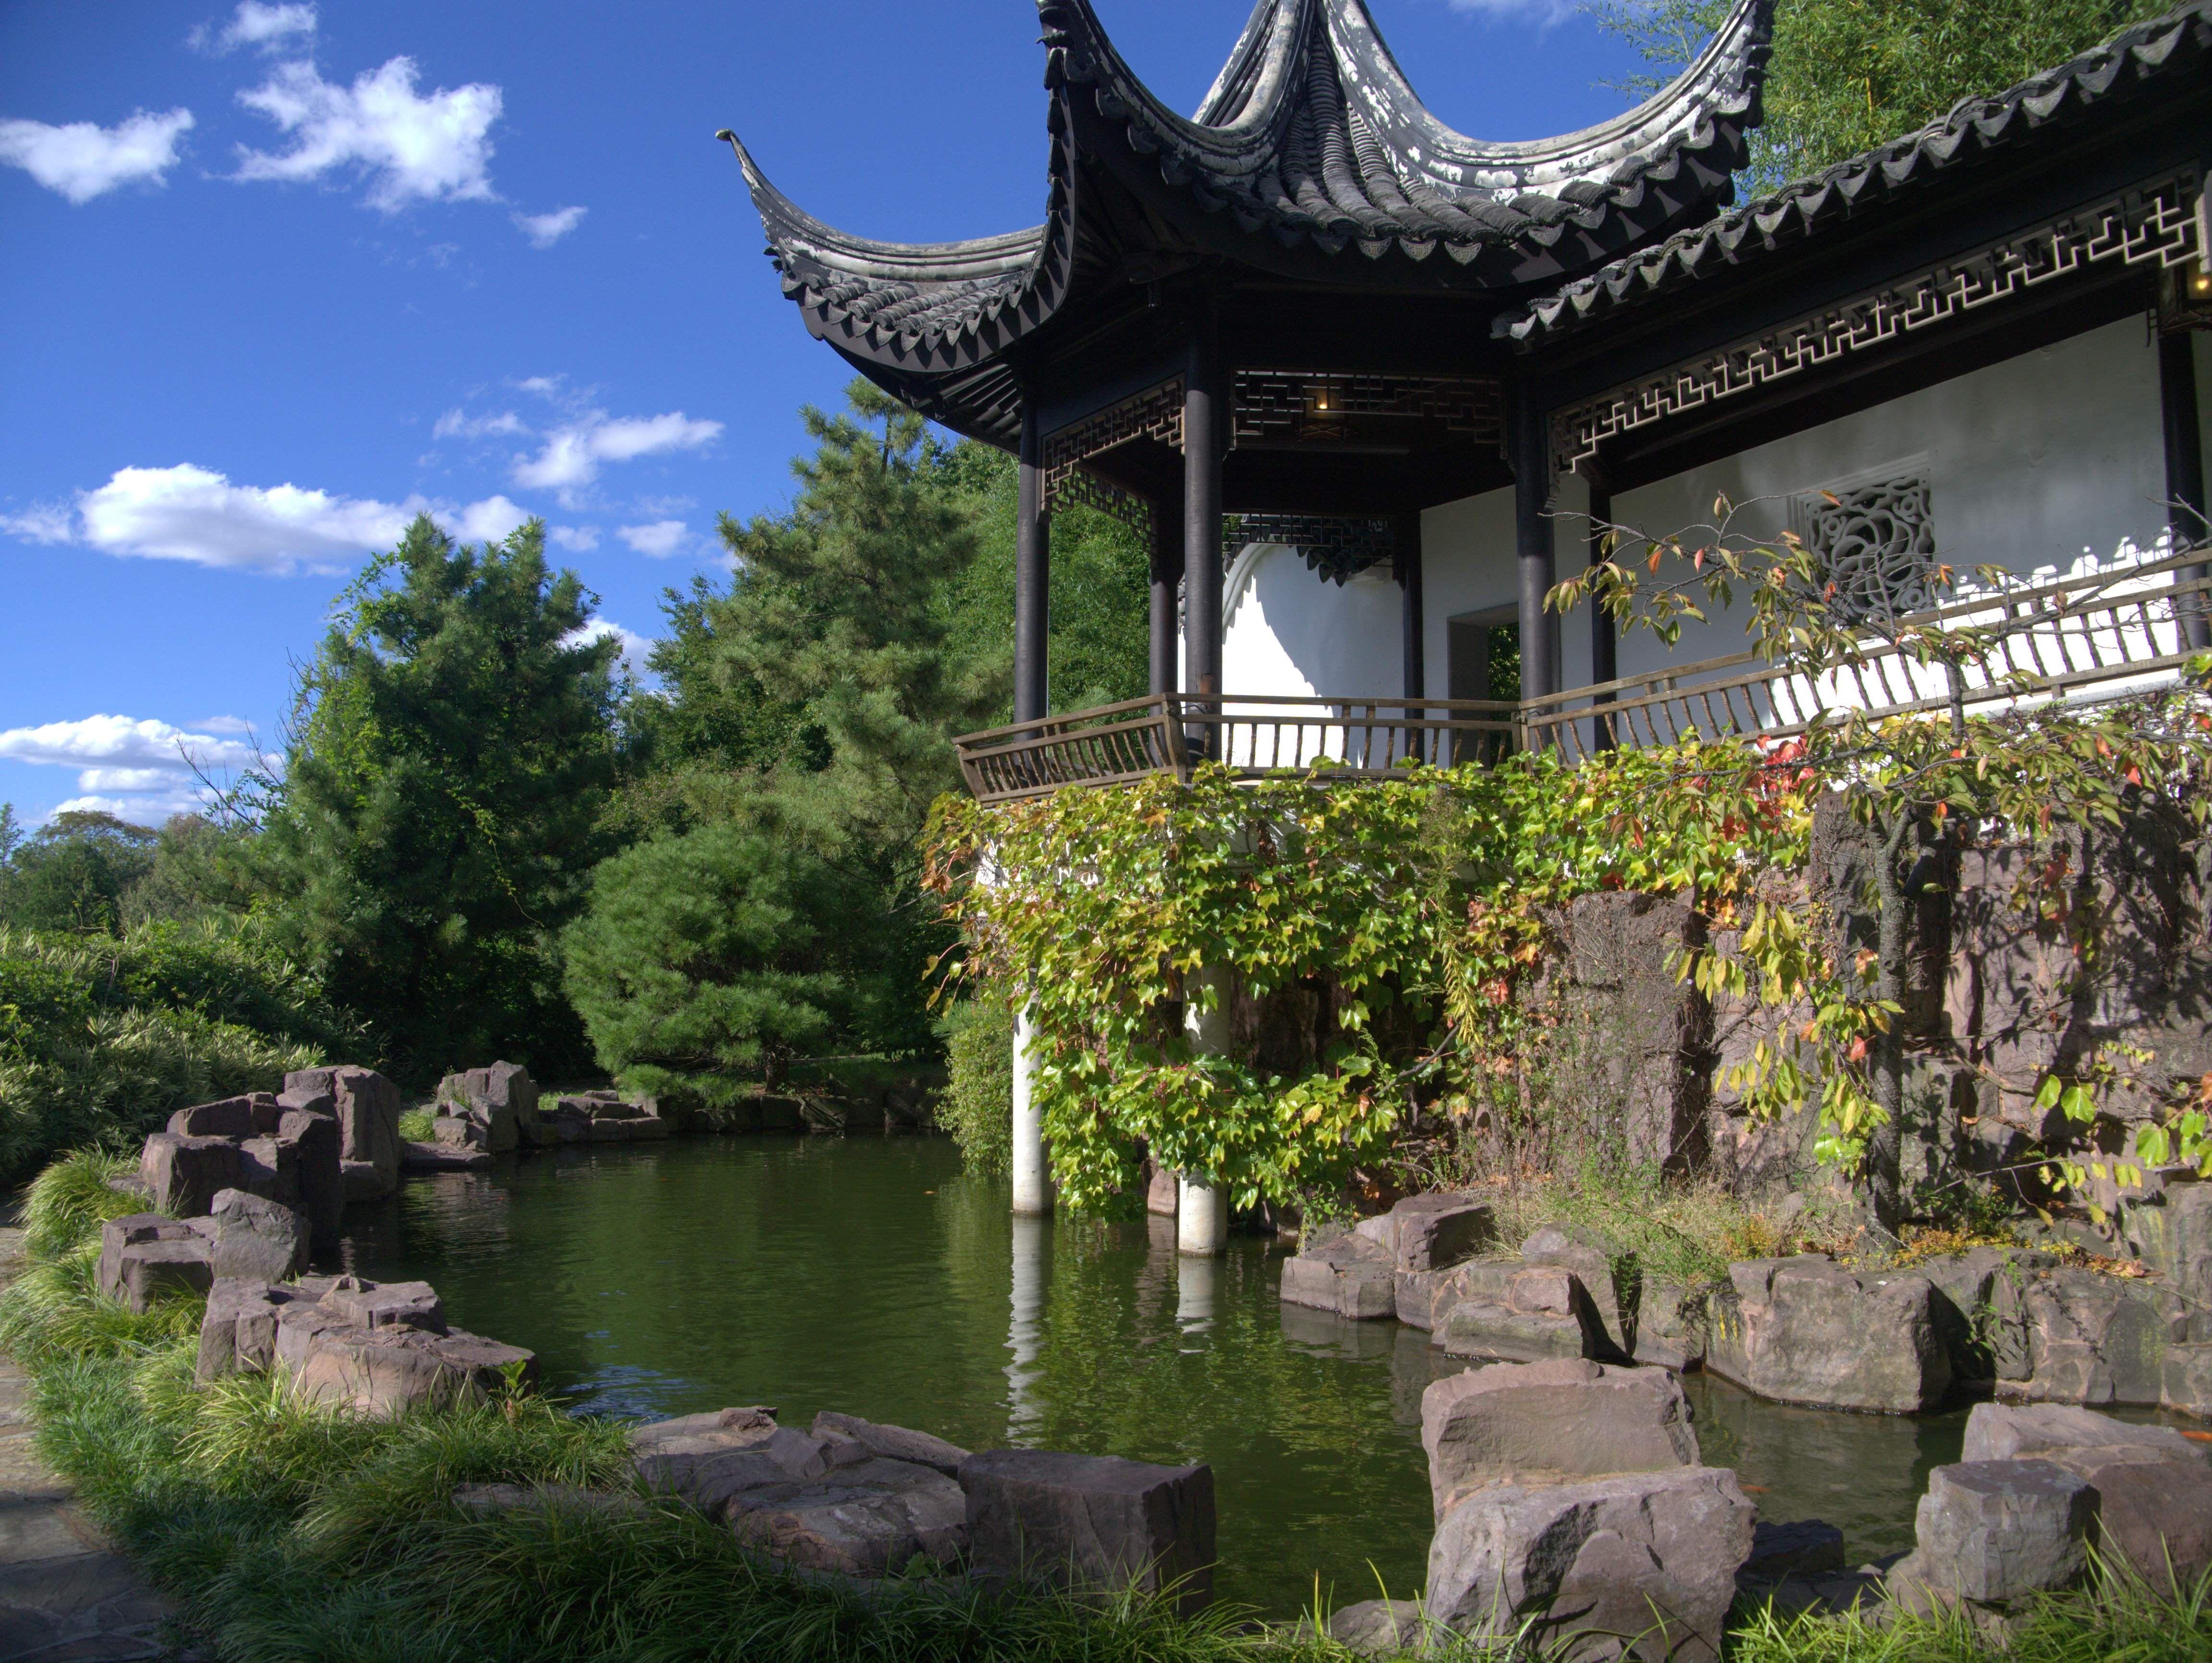 Chinese scholars garden staten island new york city pinterest staten island snug harbor for New york chinese scholar s garden